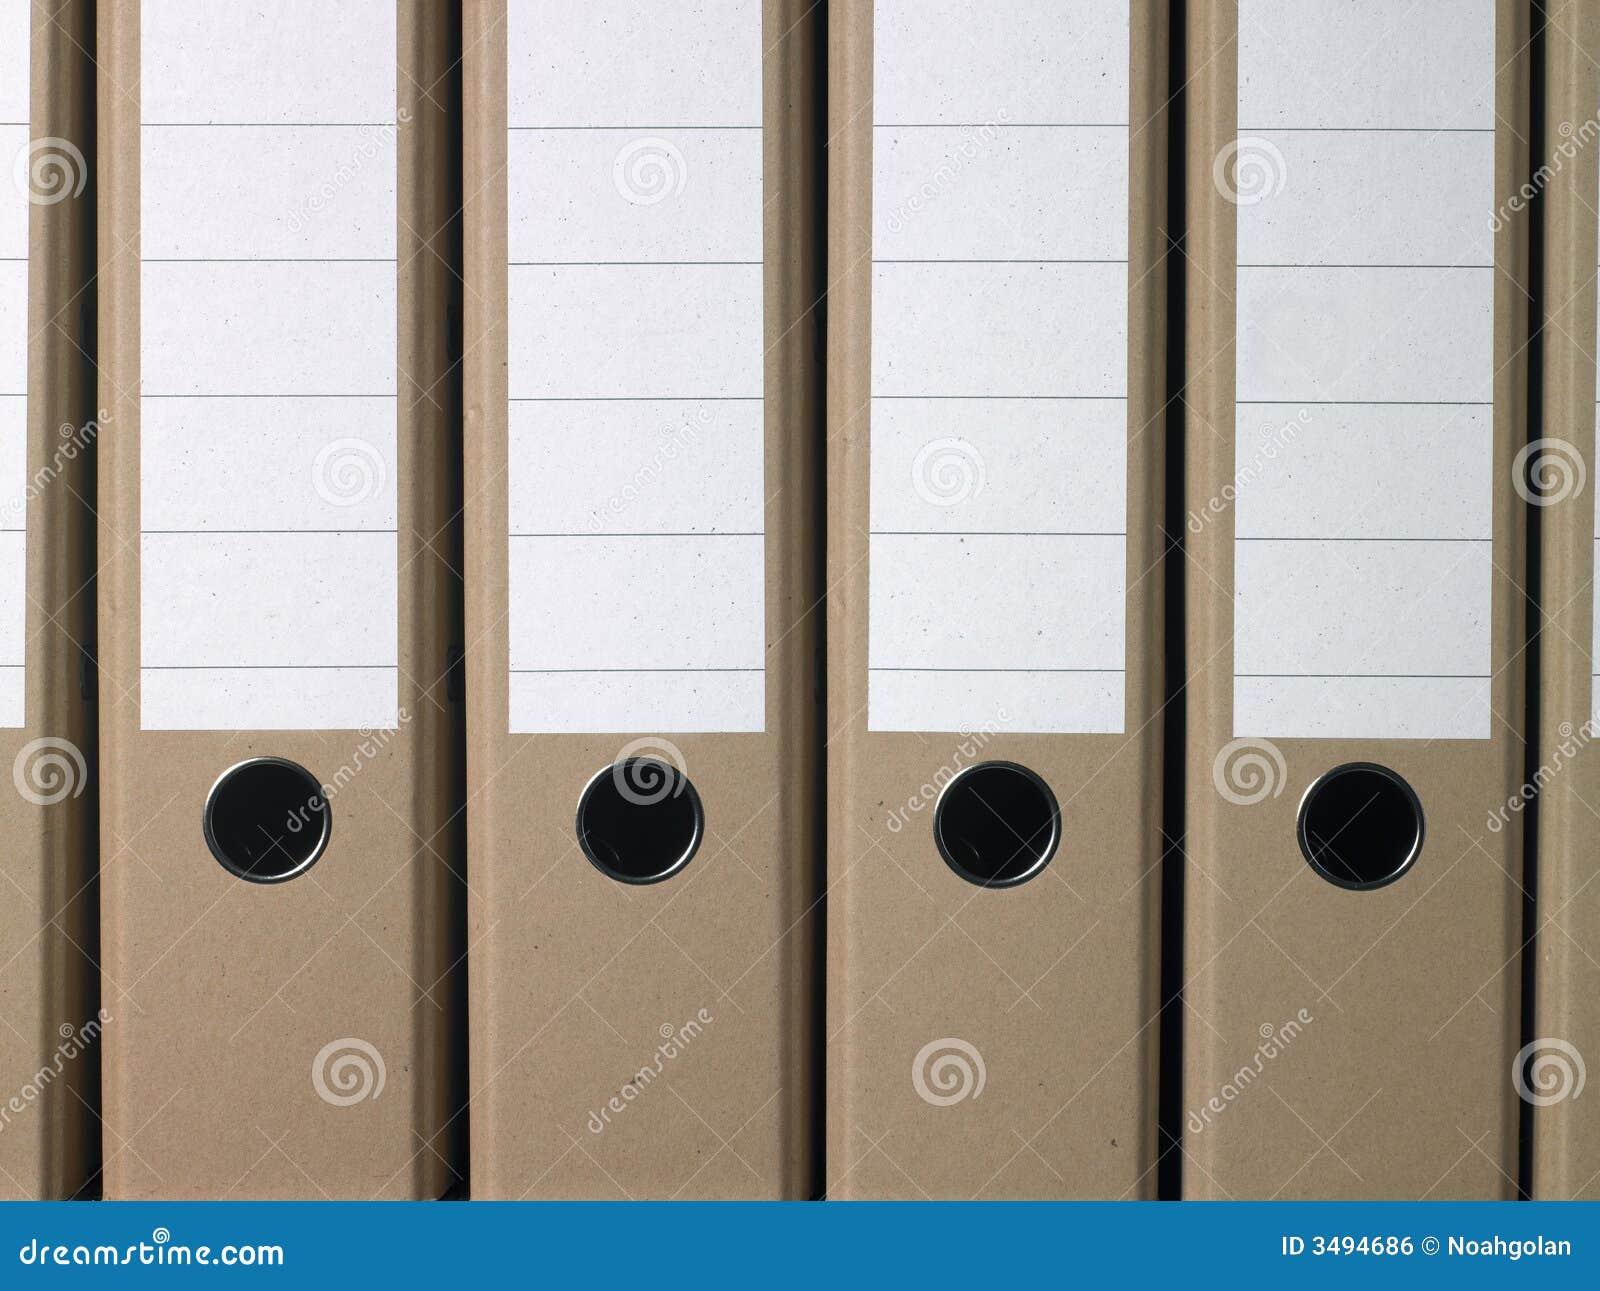 Plain Brown Office Folders Royalty Free Stock Image - Image: 3494686